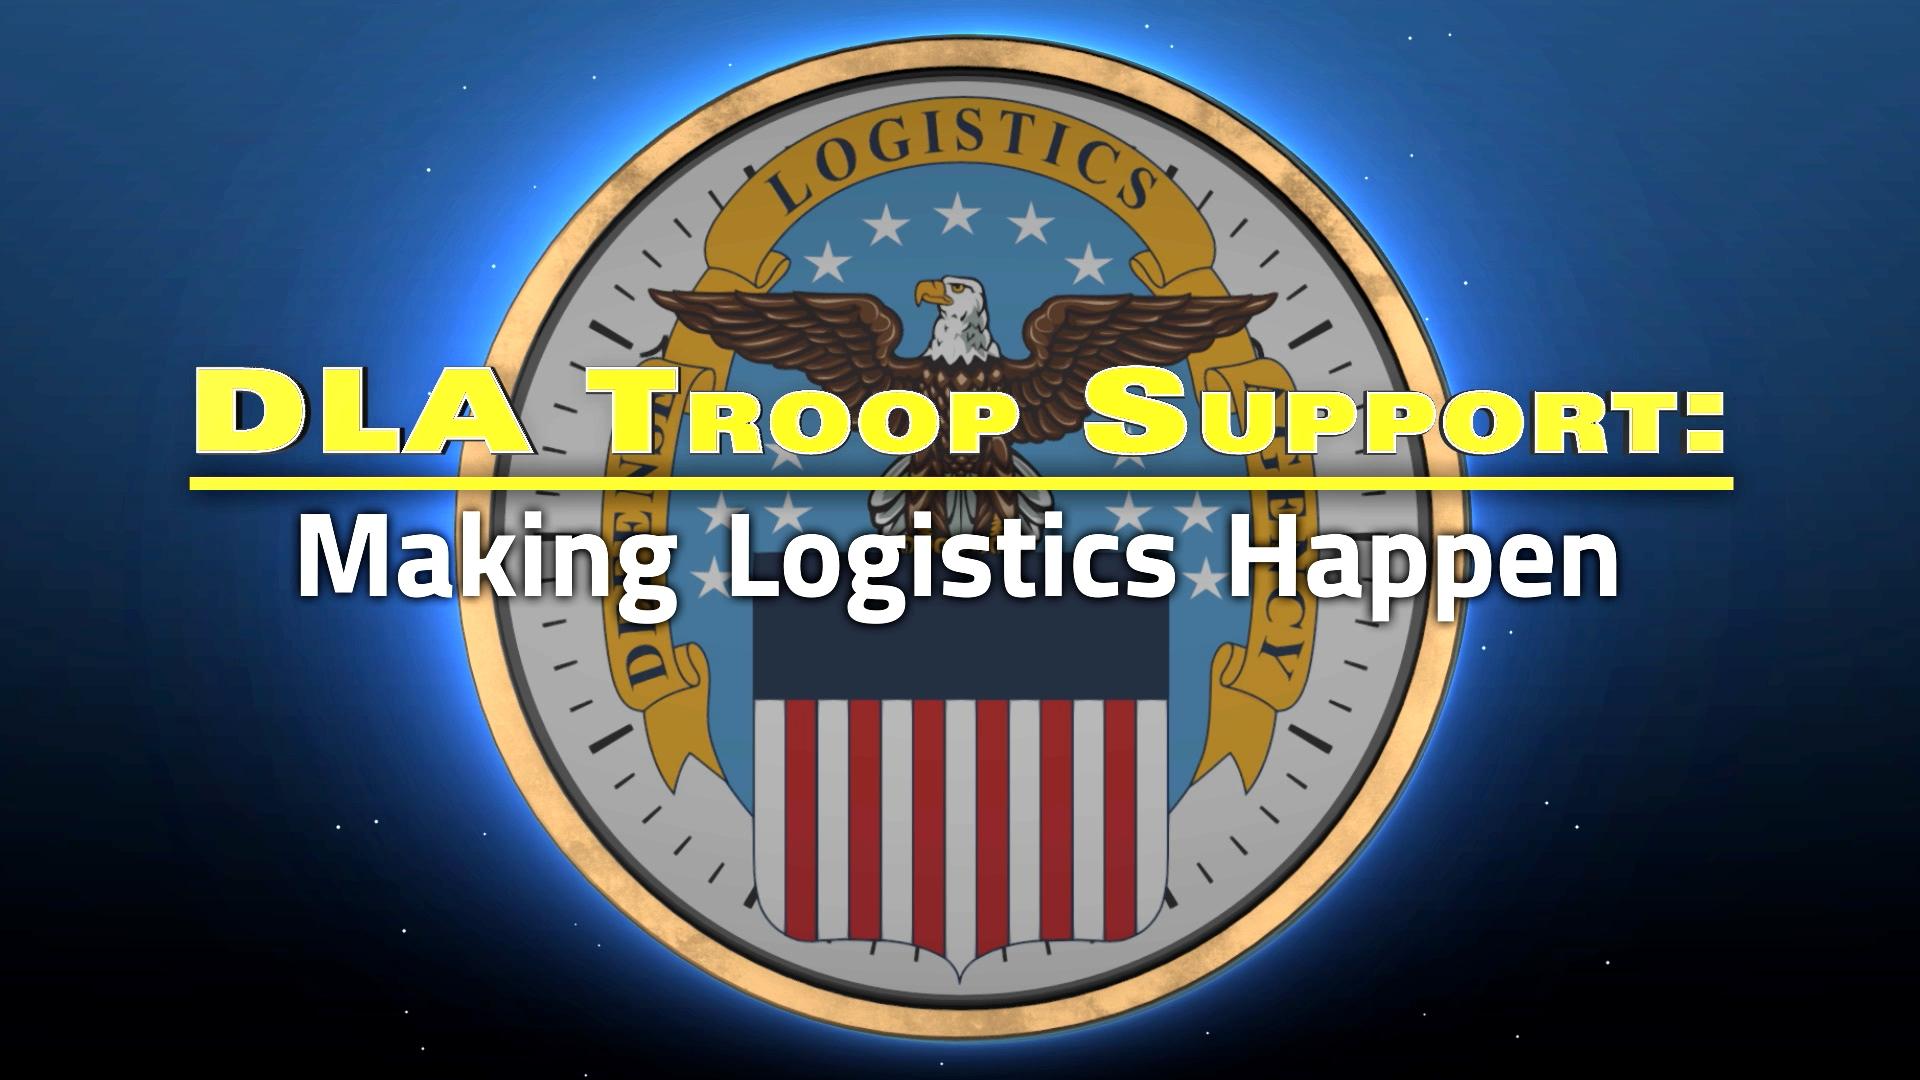 DLA Troop Support: Making Logistics Happen